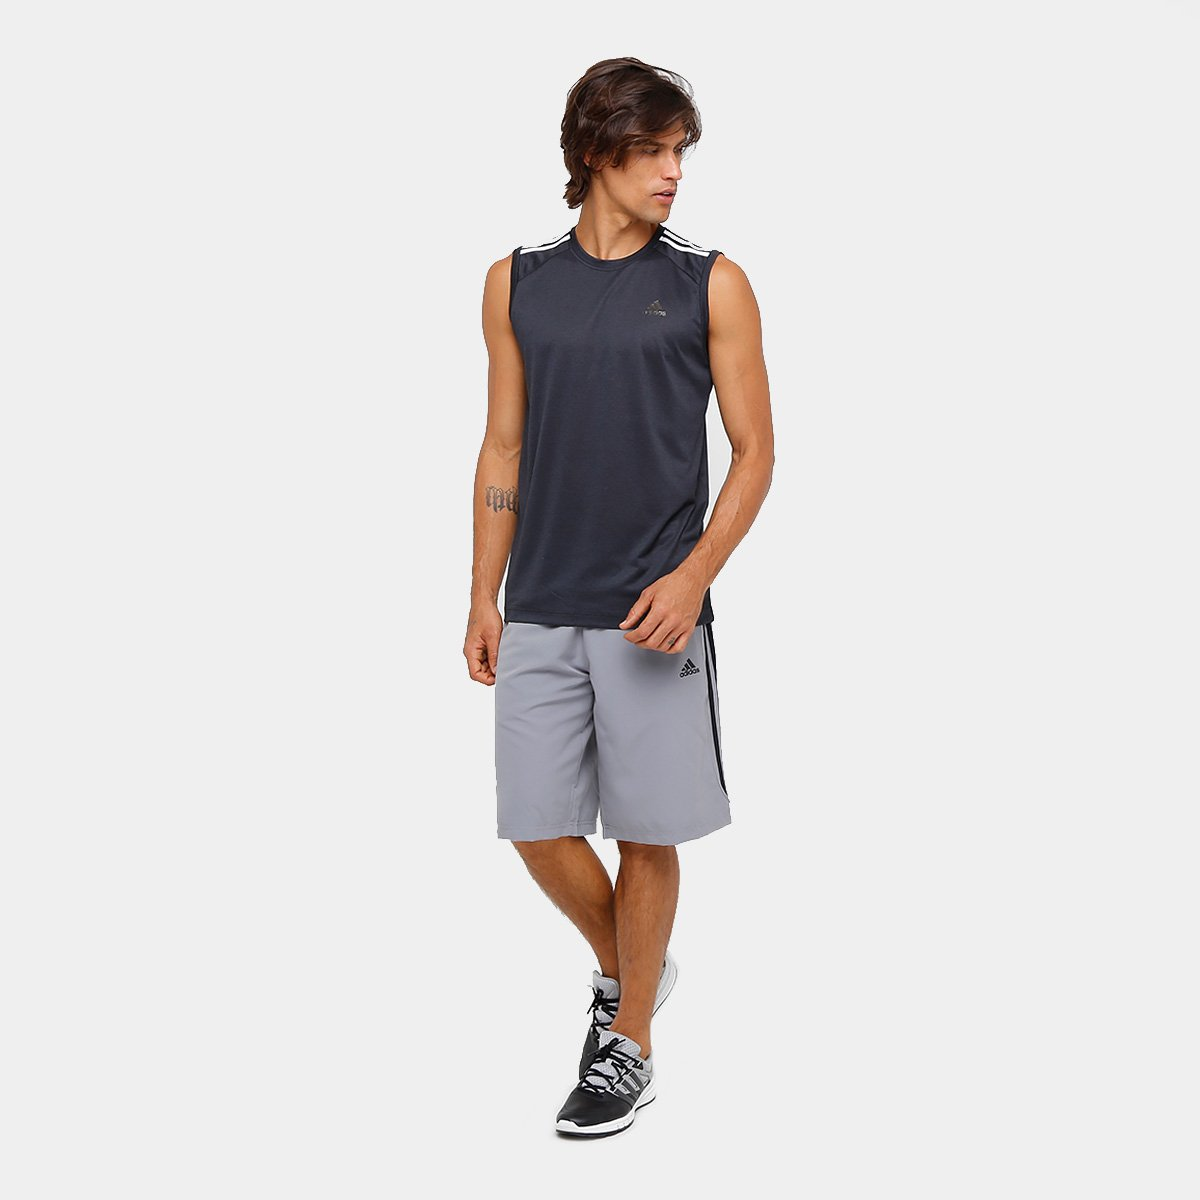 4991c50ad8 Camiseta Regata Adidas Ess 3S Egb Masculina